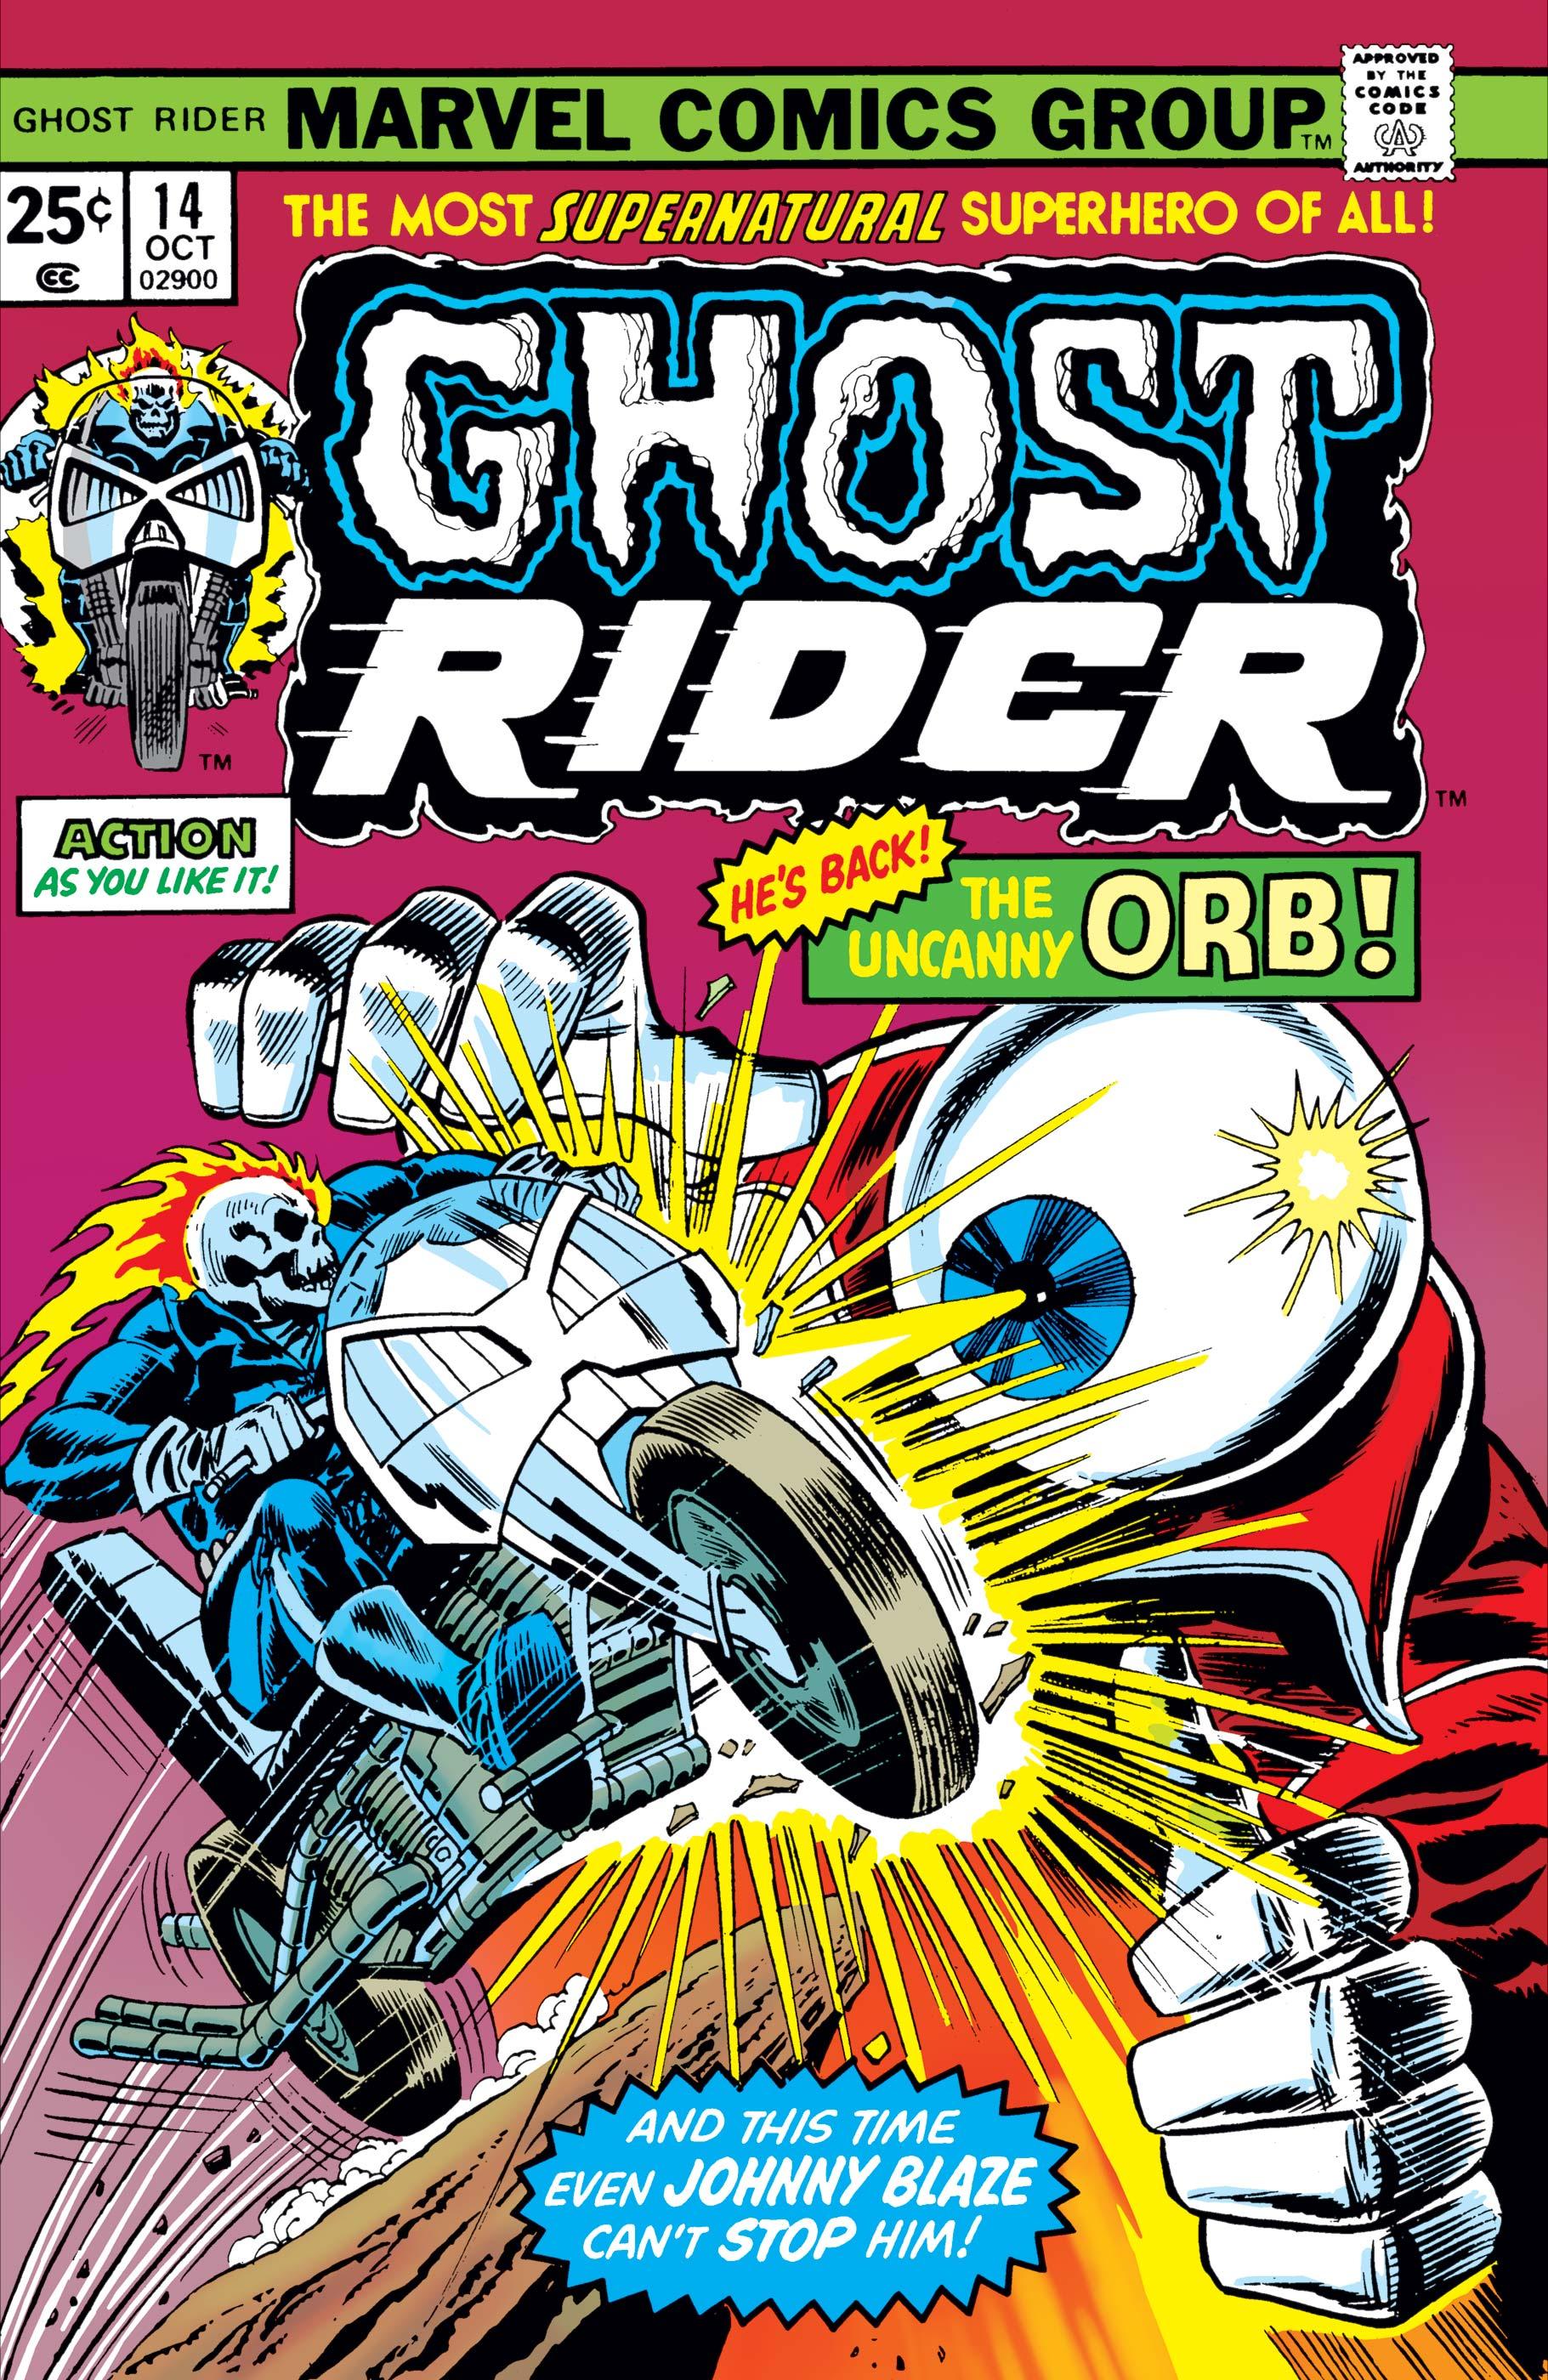 Ghost Rider (1973) #14